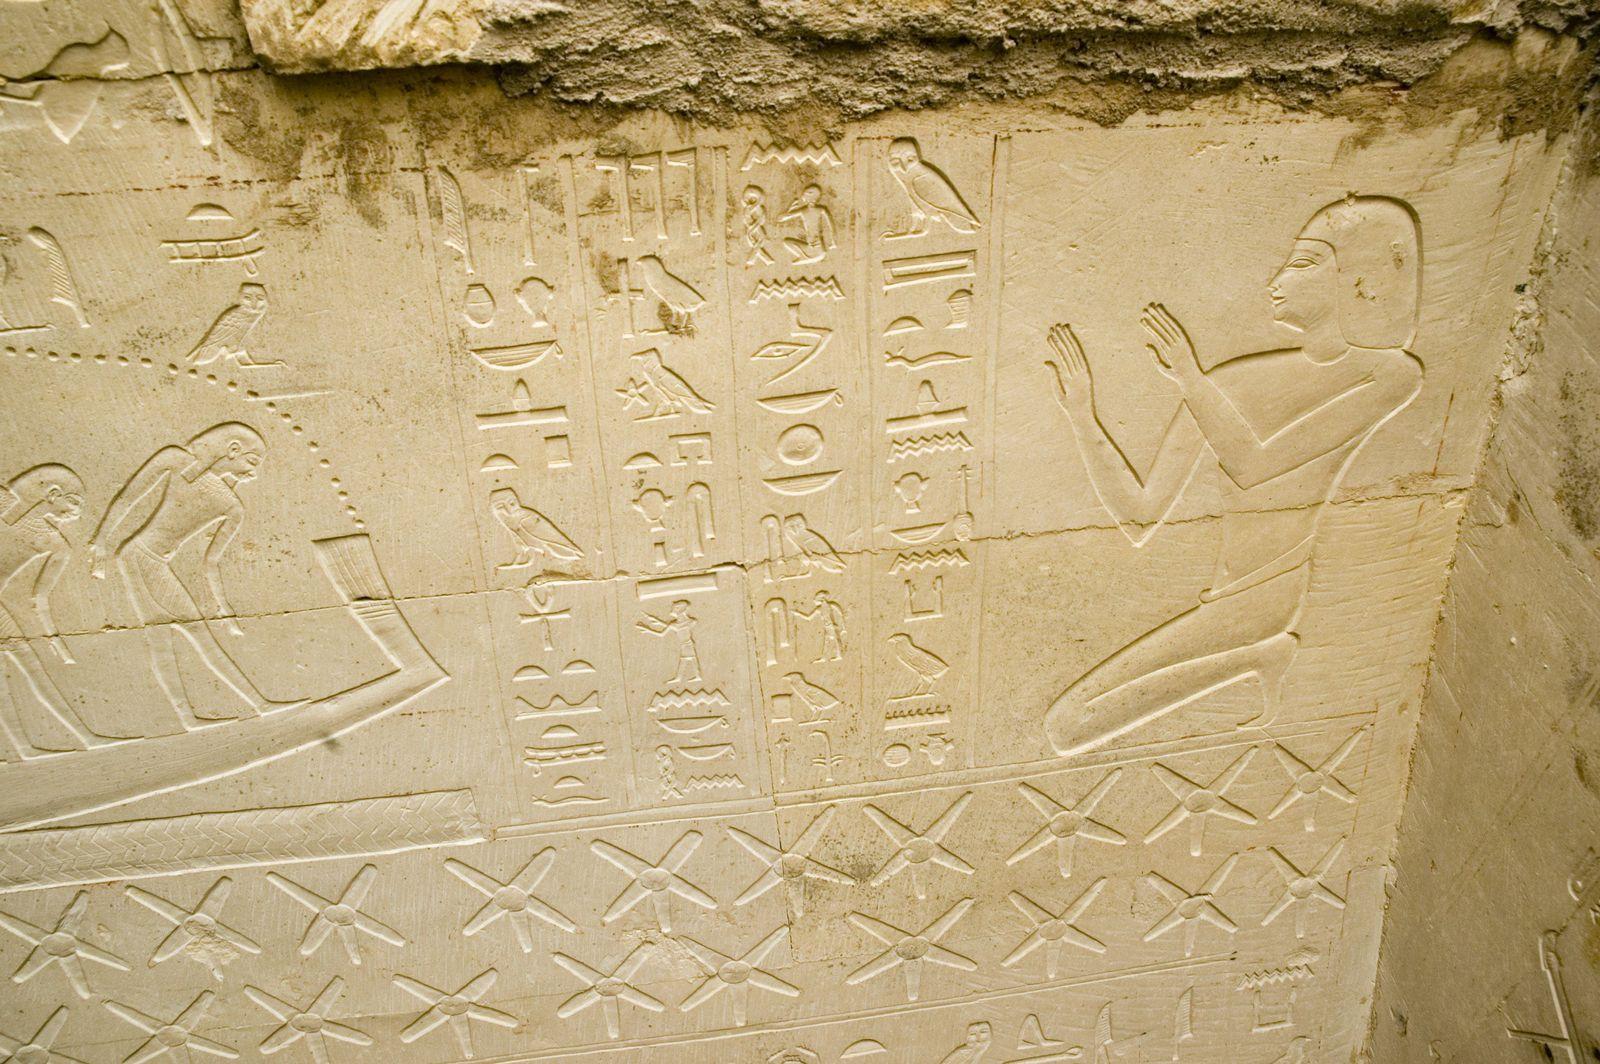 EGYPT-ARCHAEOLOGY-TOMB-MENEKHIBNEKAU